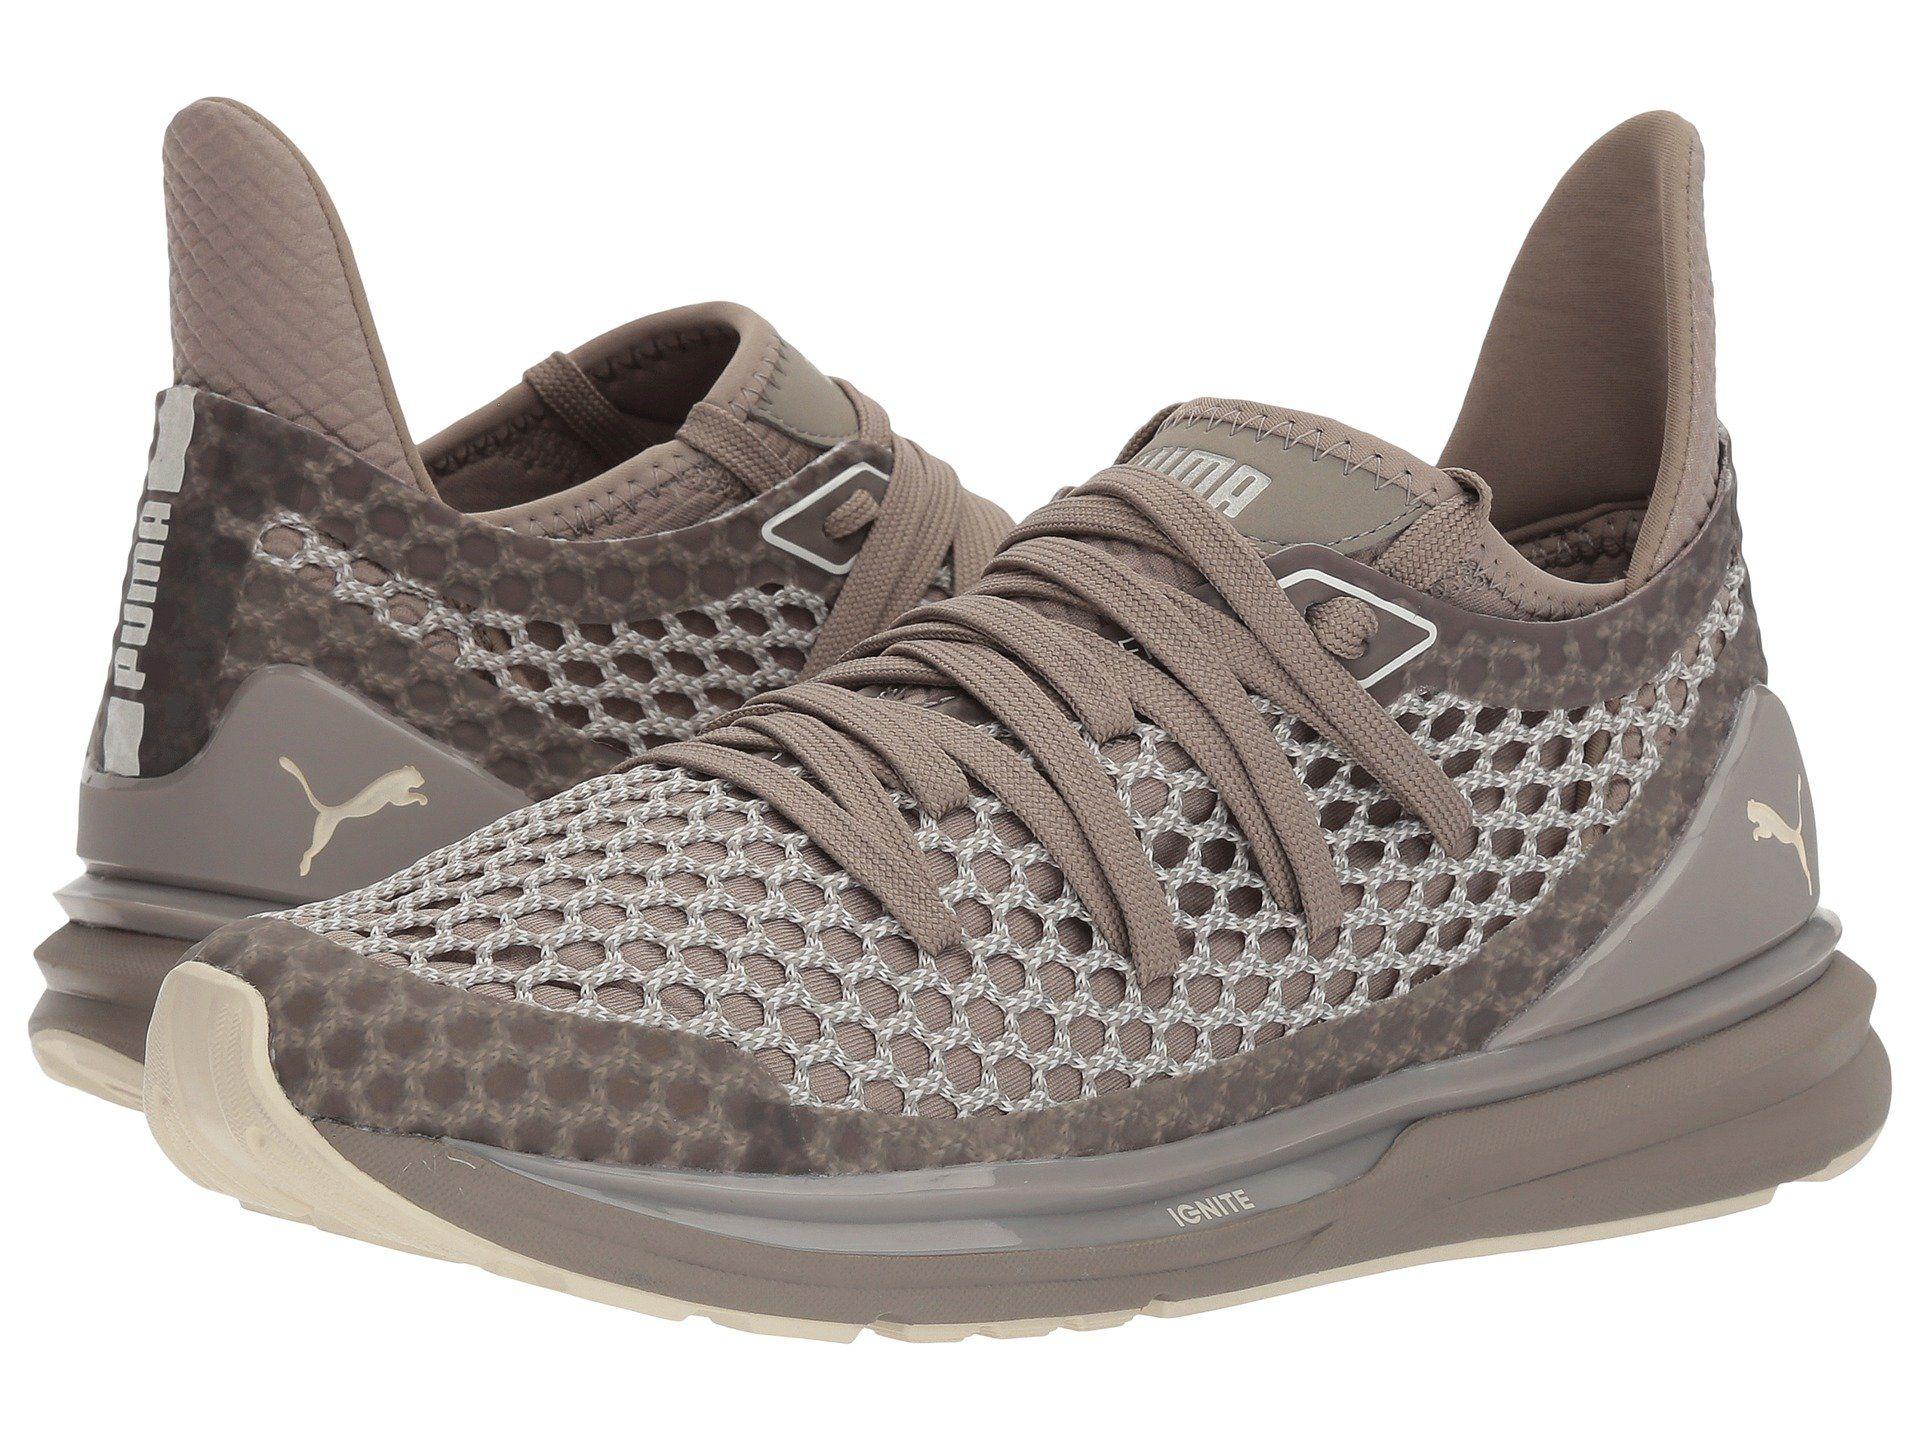 info for 11fdb a9c1b PUMA Ignite Limitless Netfit Multi. #puma #shoes # | Puma ...